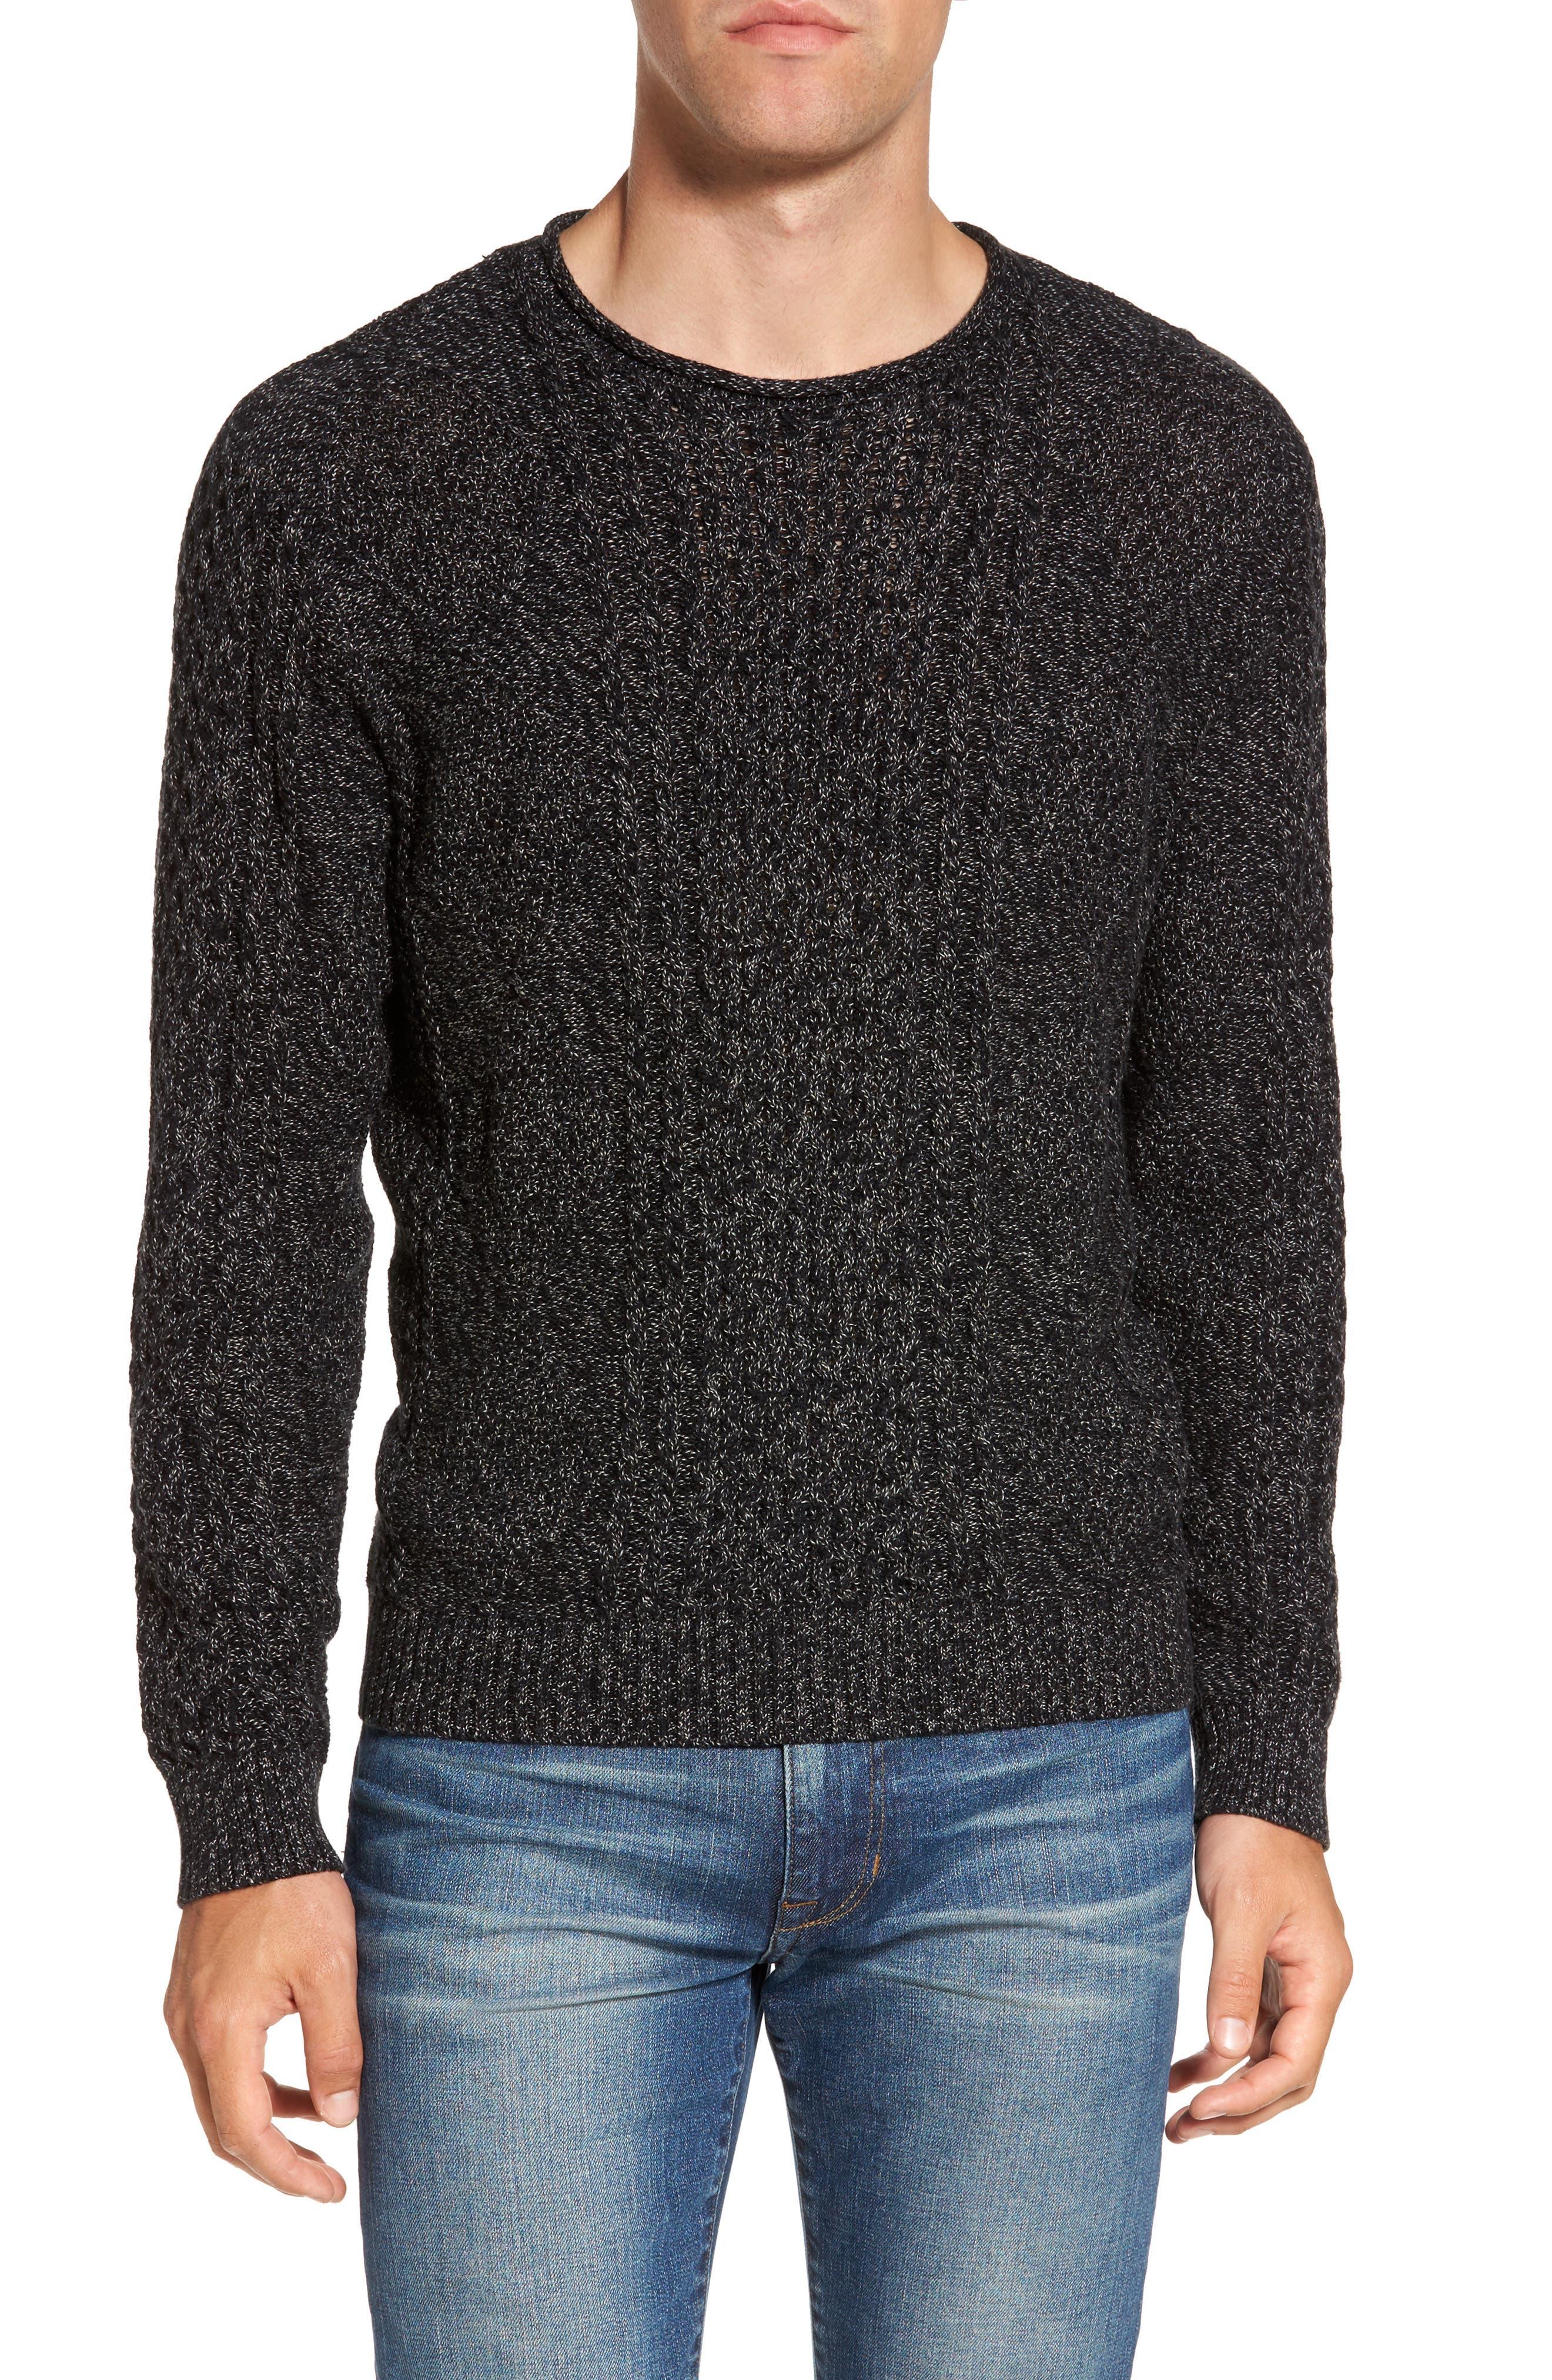 Nordstrom Men's Shop Fisherman Sweater (Tall)